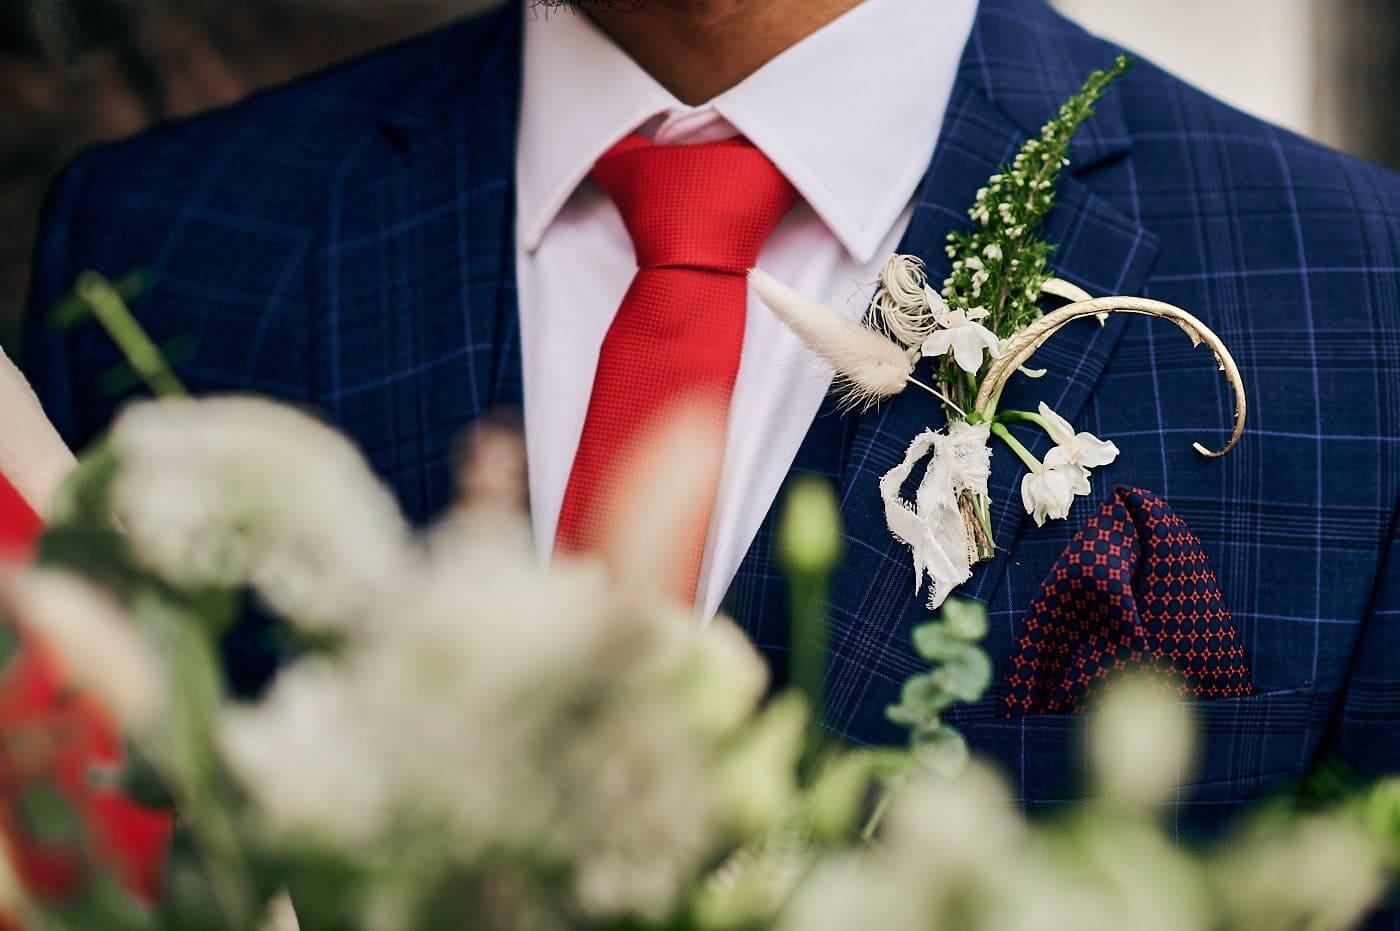 Detail of groom's buttonhole flower